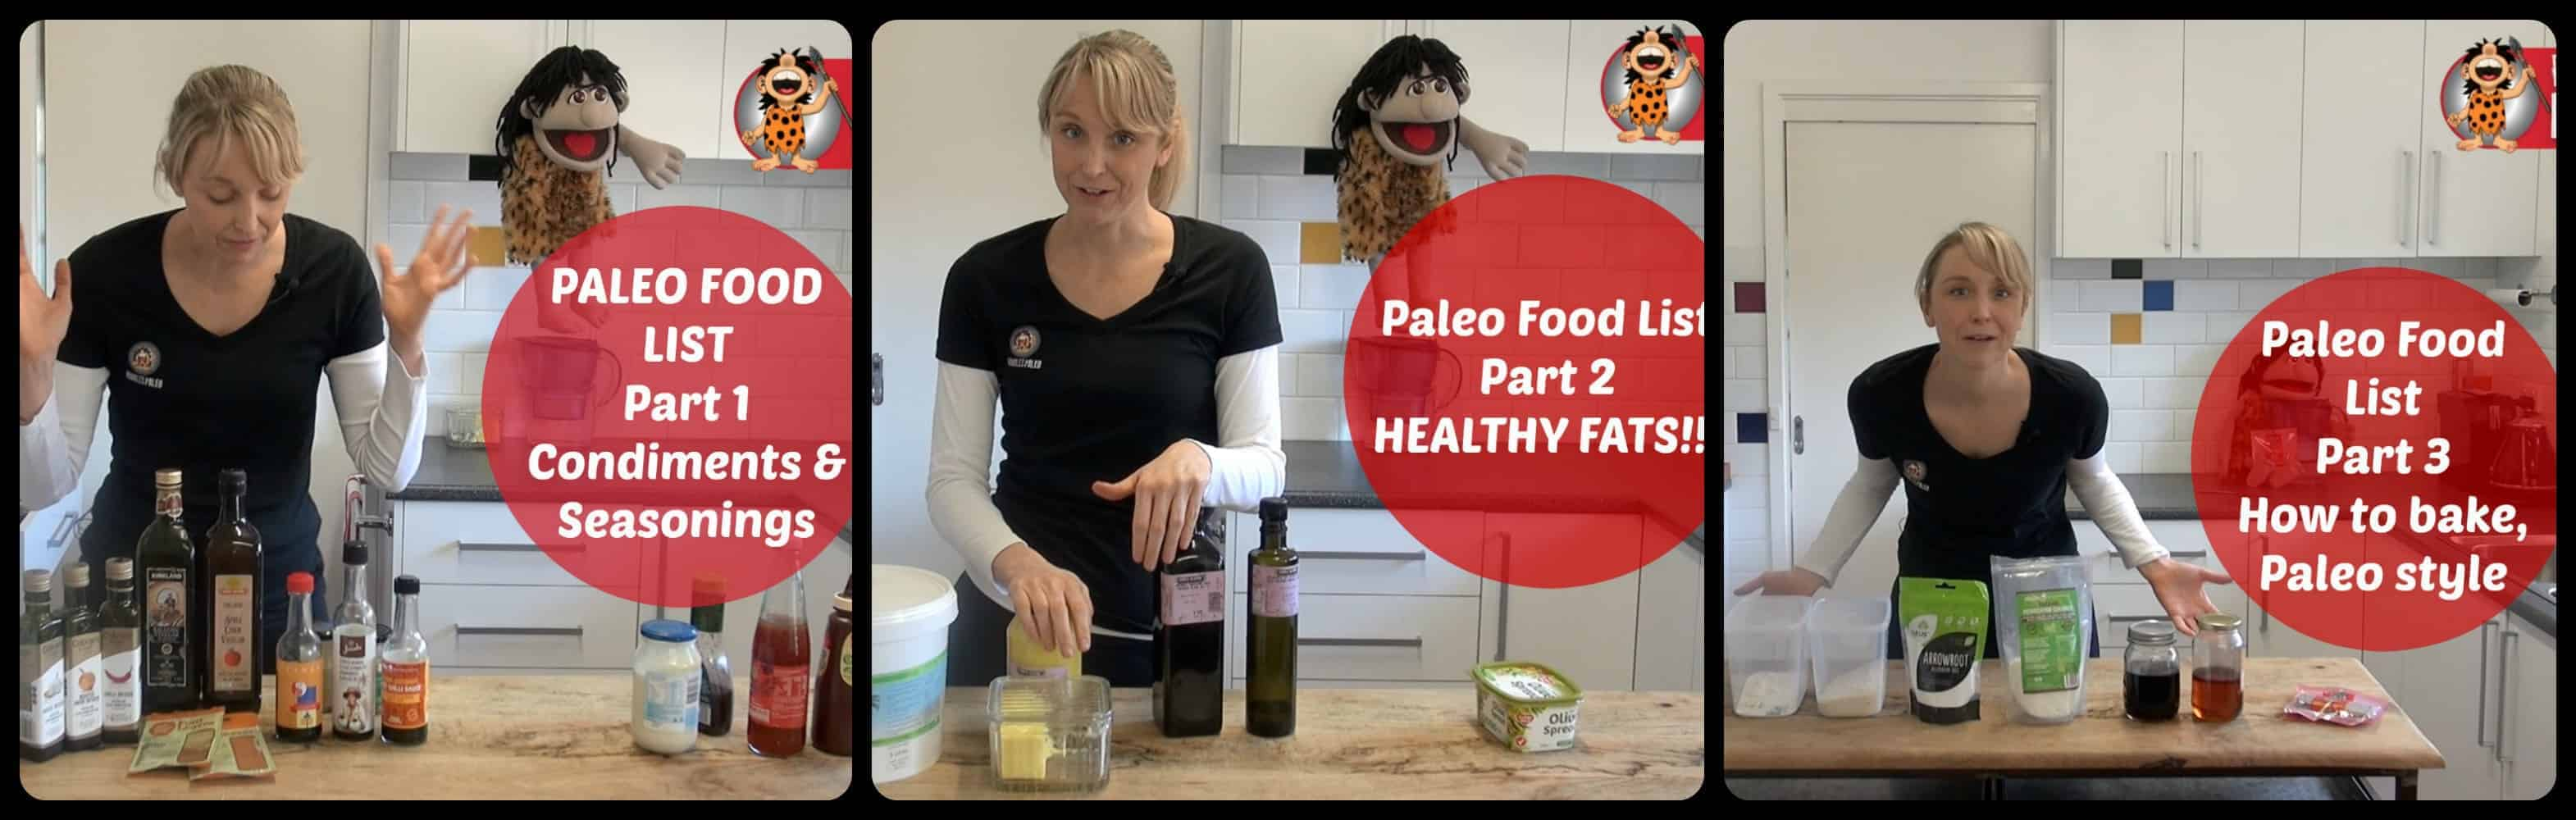 Part 1 2 3 Paleo shopping ingredients paleo staples